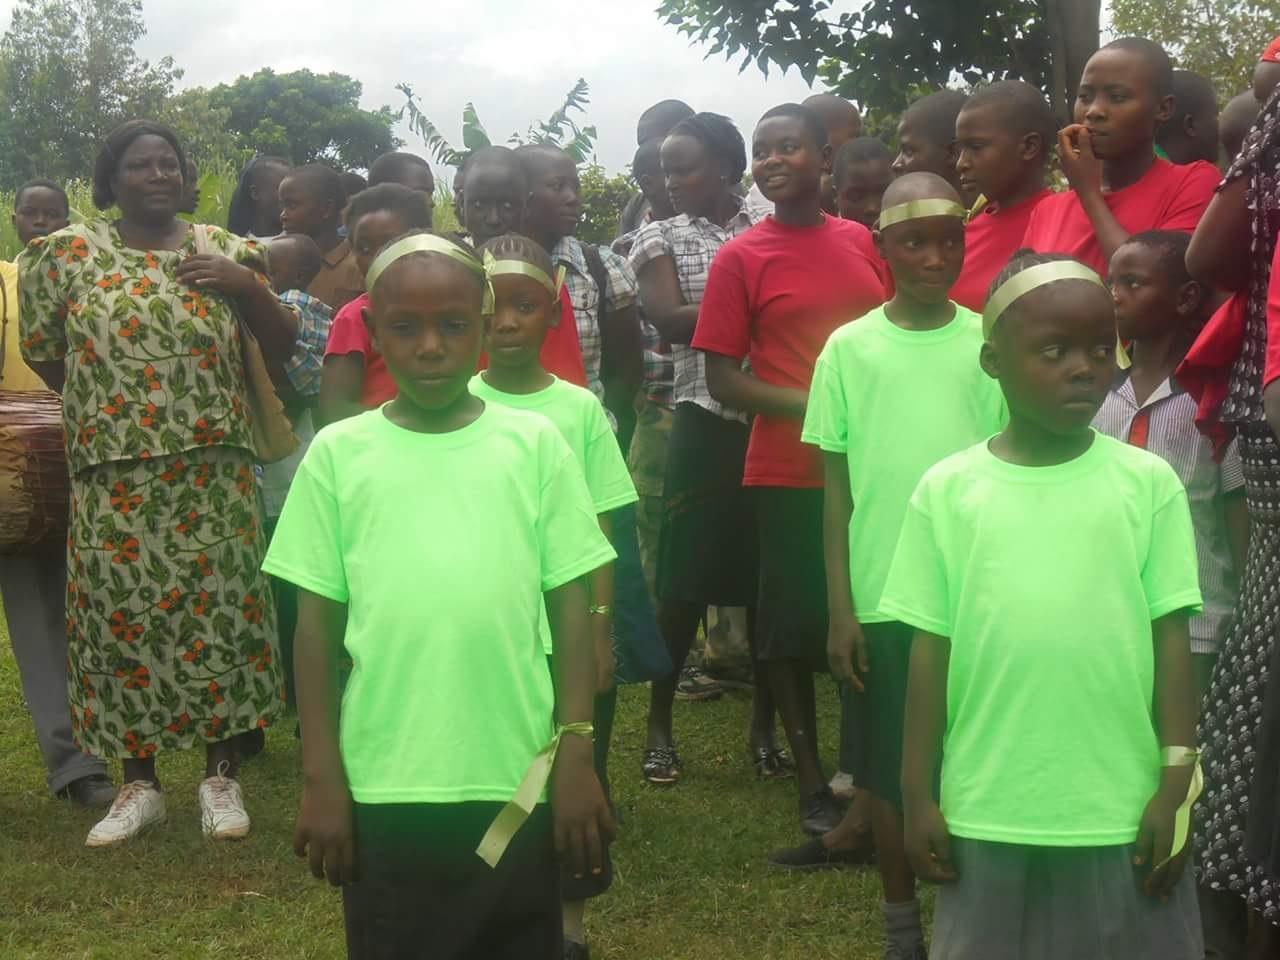 Kenya green shirts.jpg